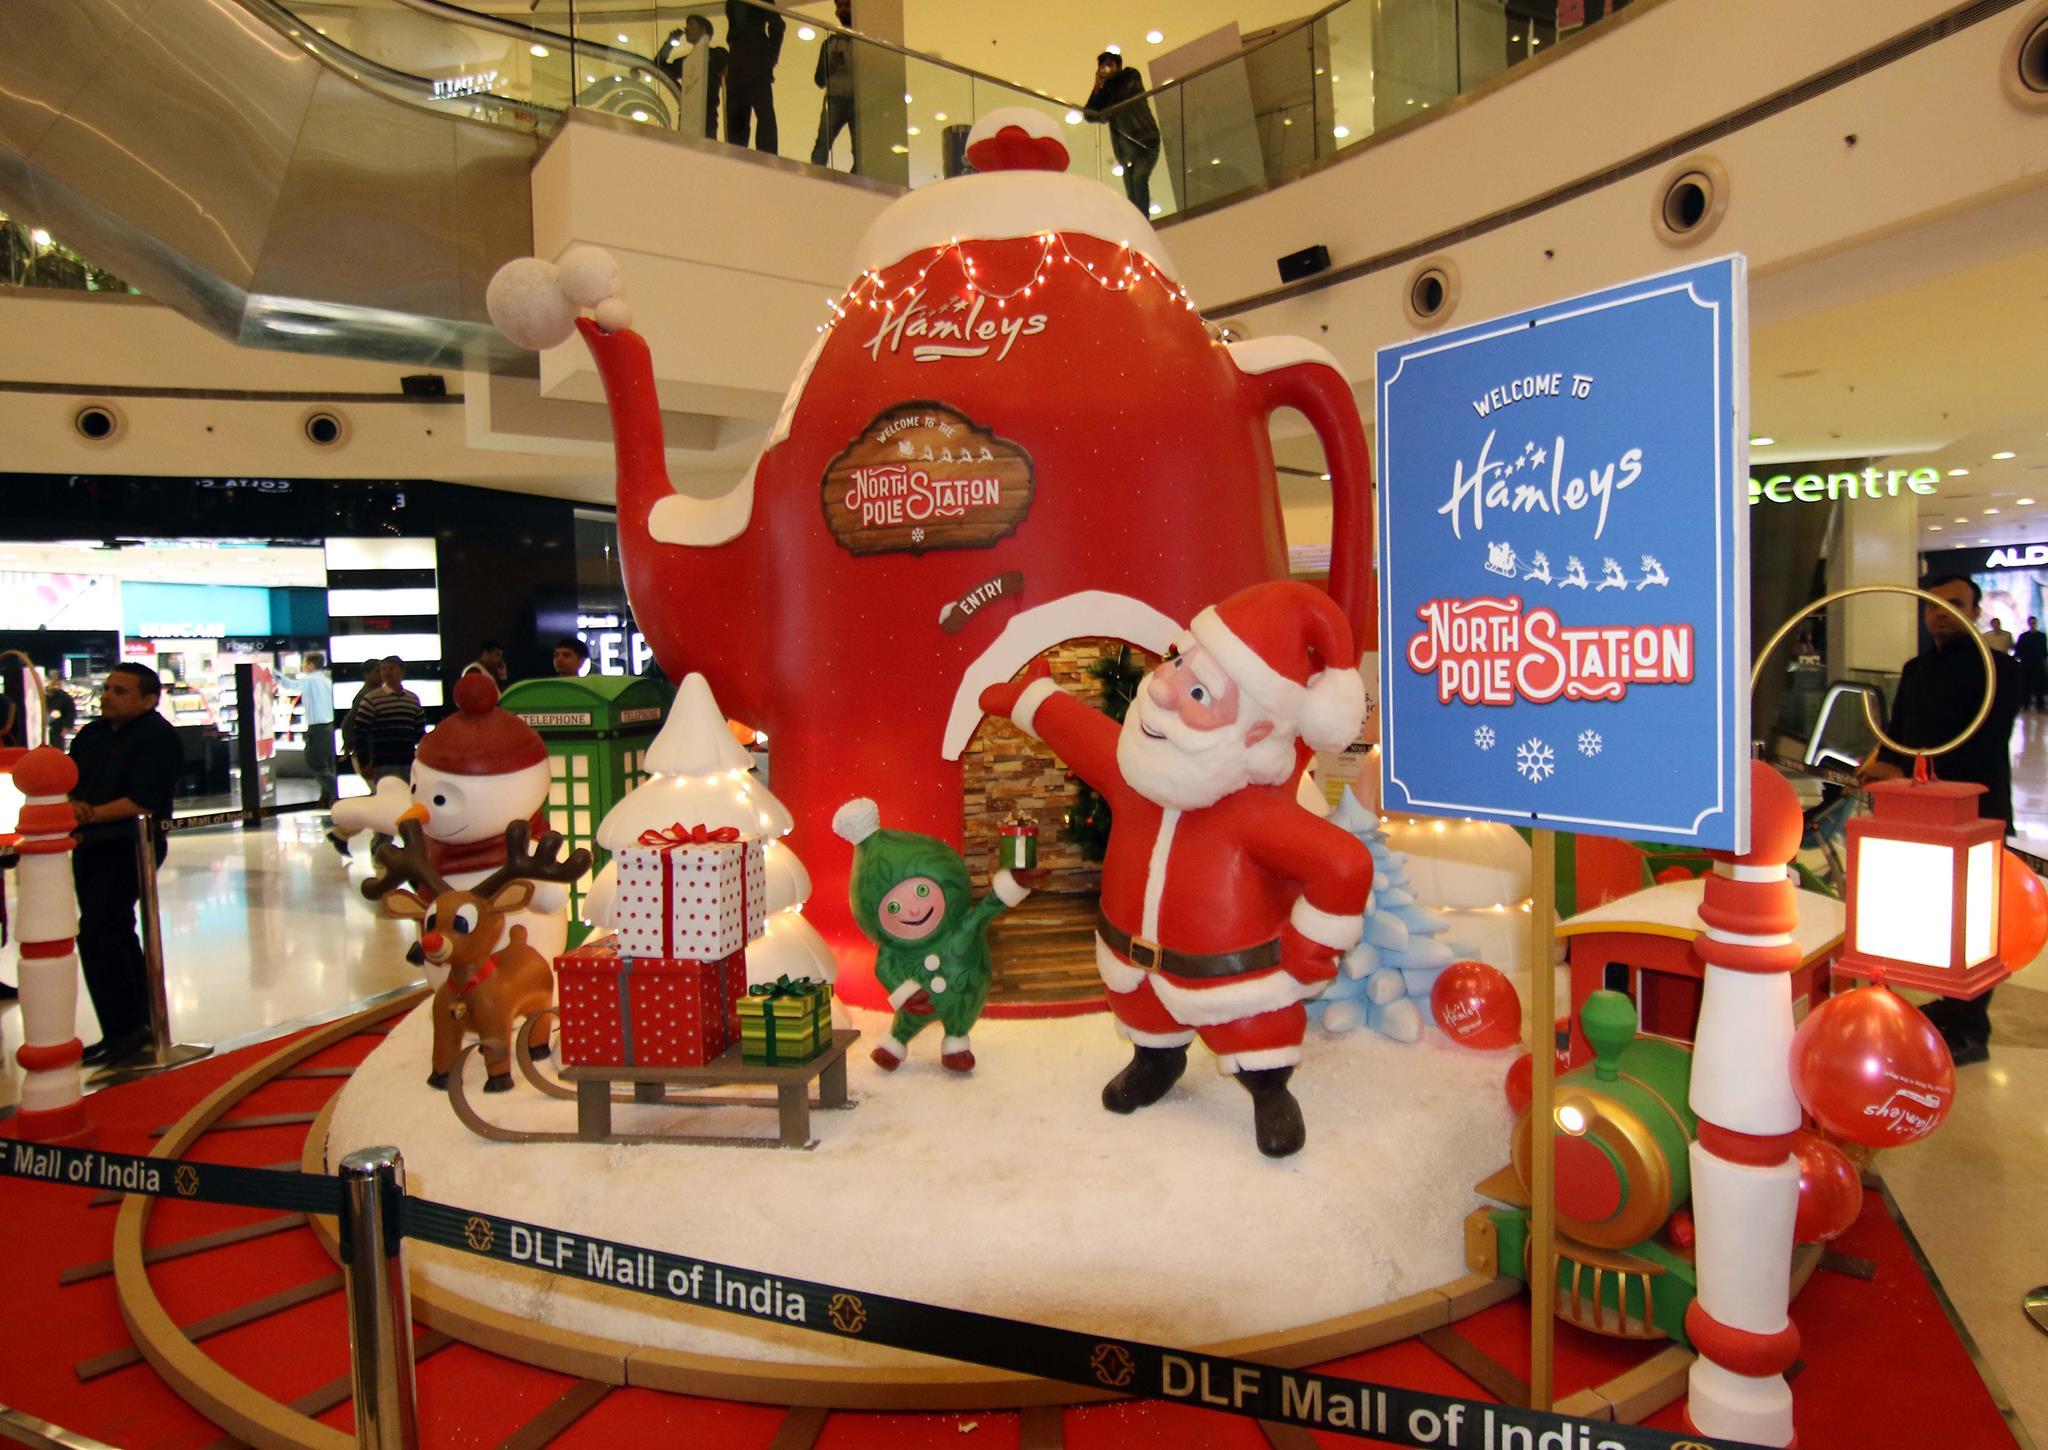 hamleys north pole setup at dlf mall of india